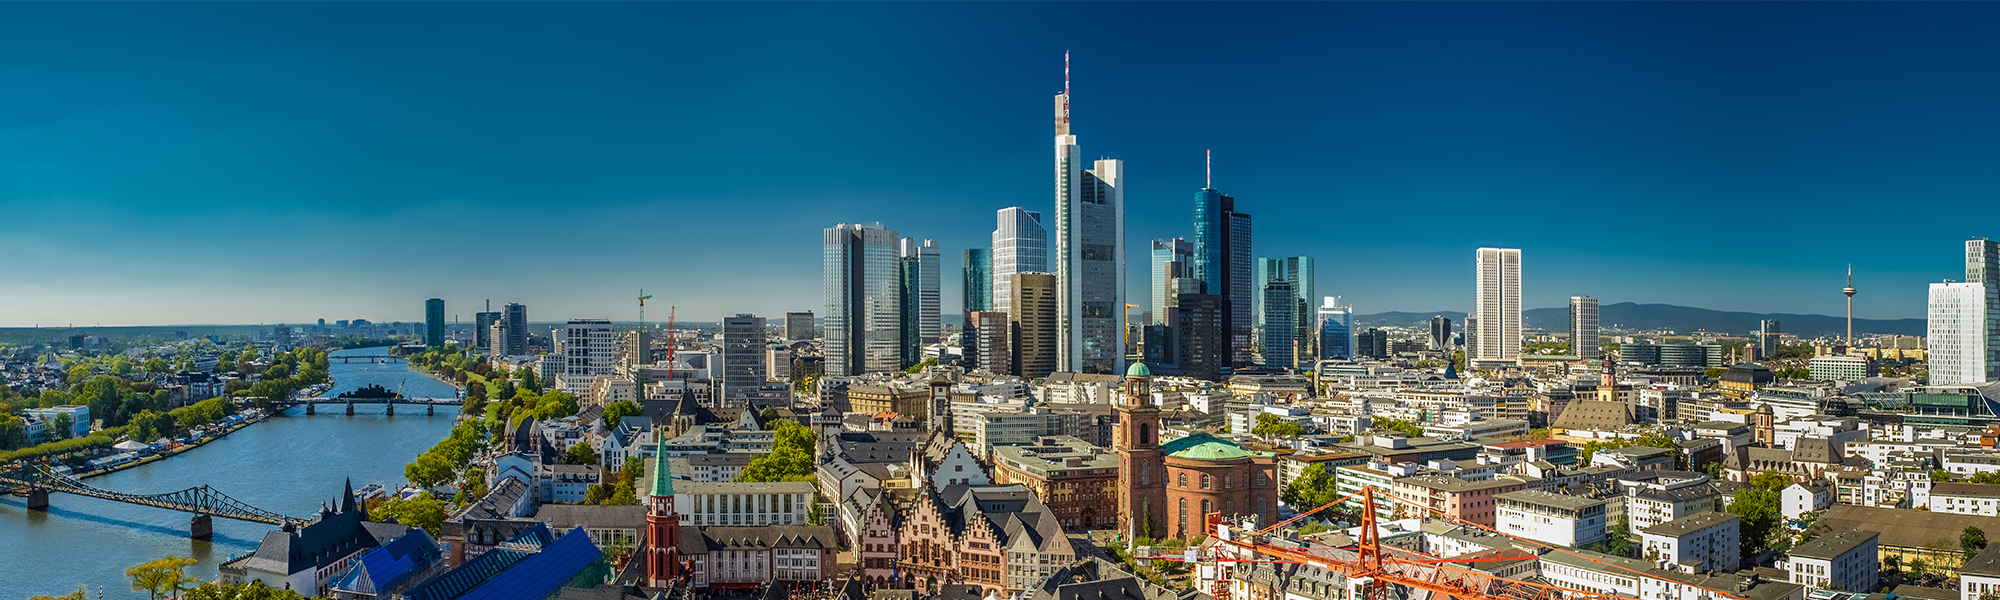 Engineering & IT Personalvermittlung Frankfurt